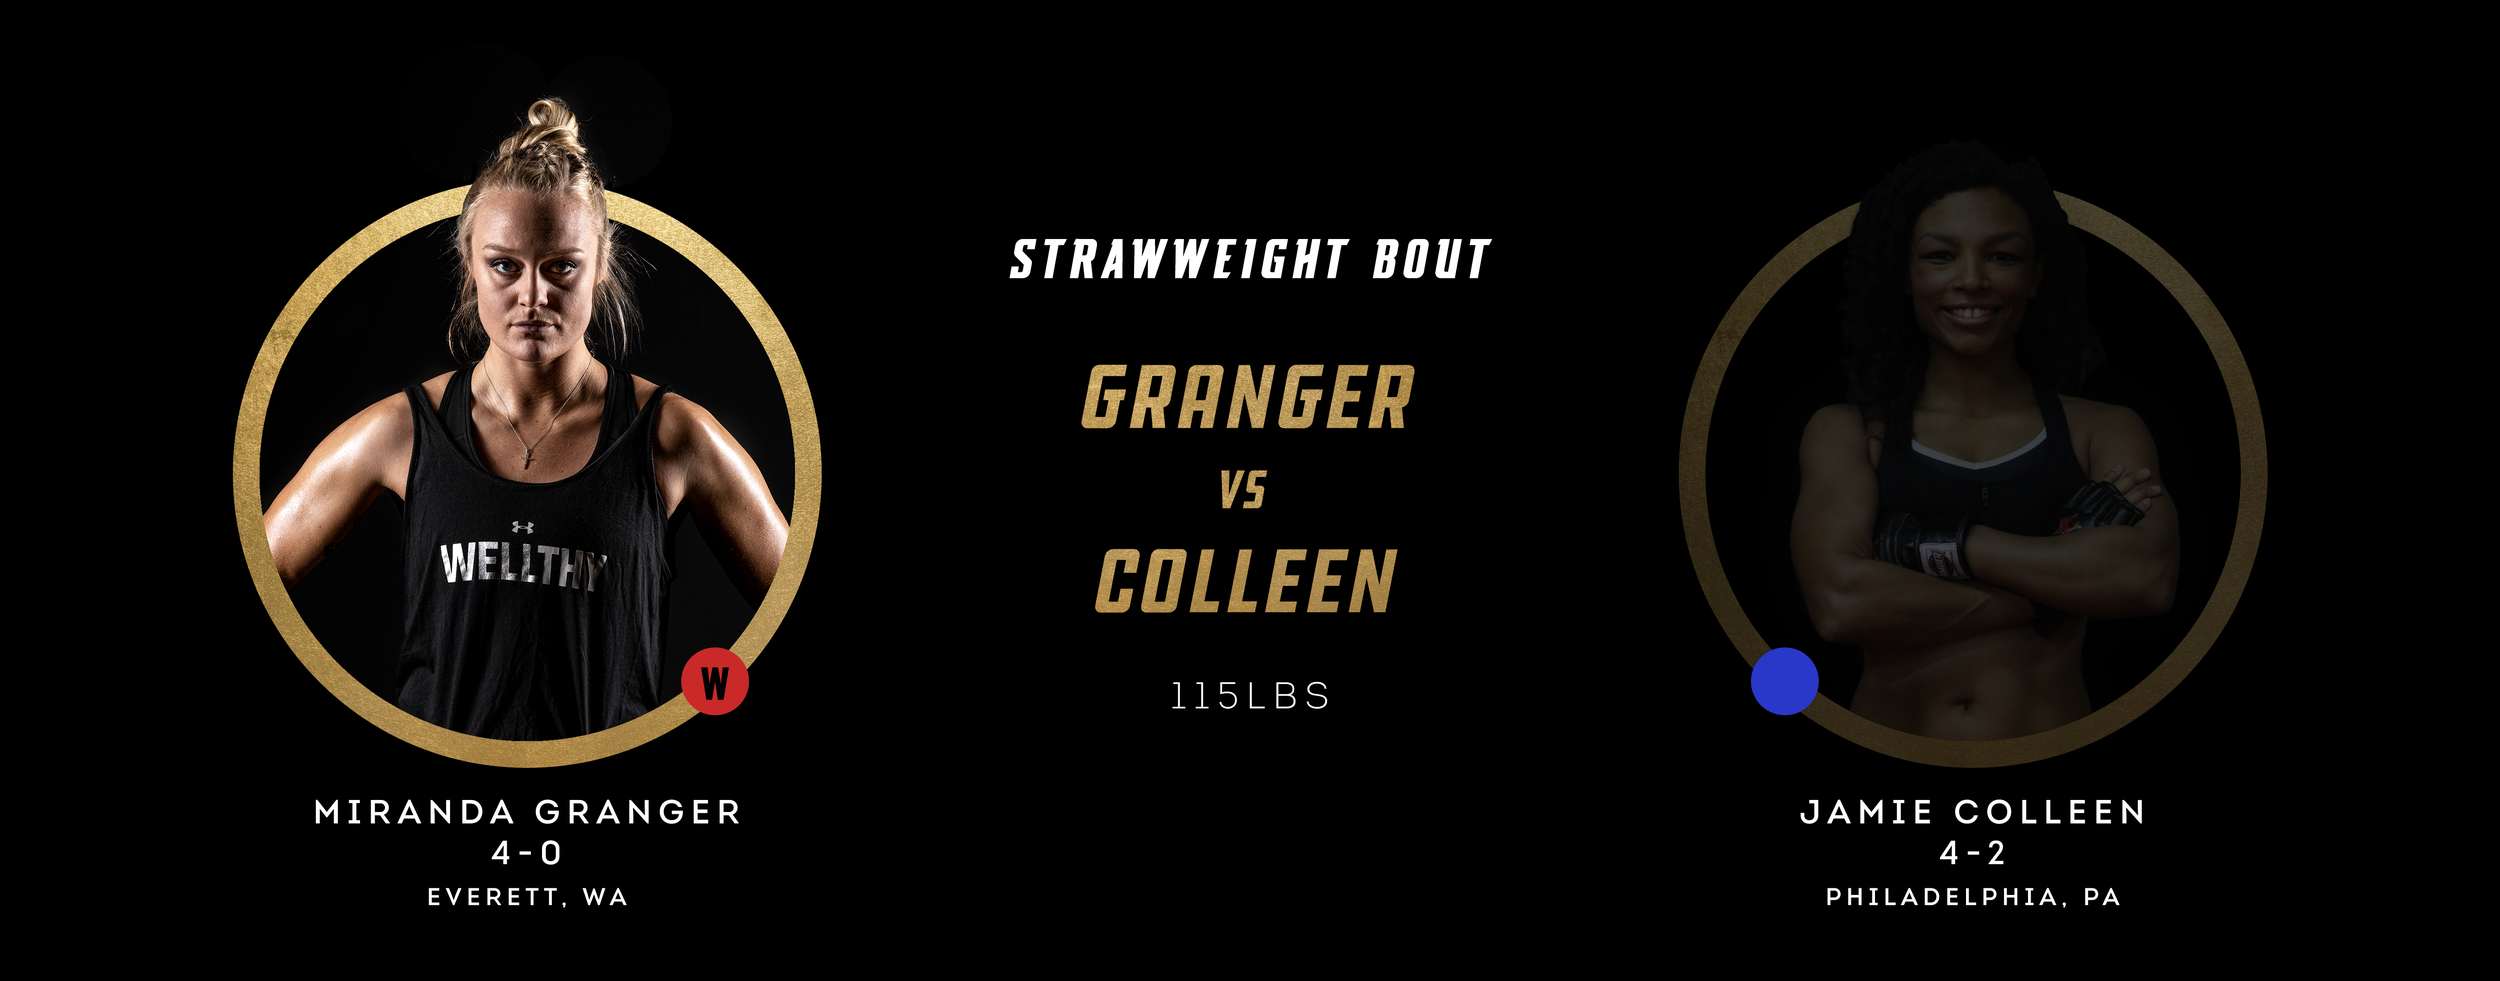 Granger_VS_Colleen_W.png